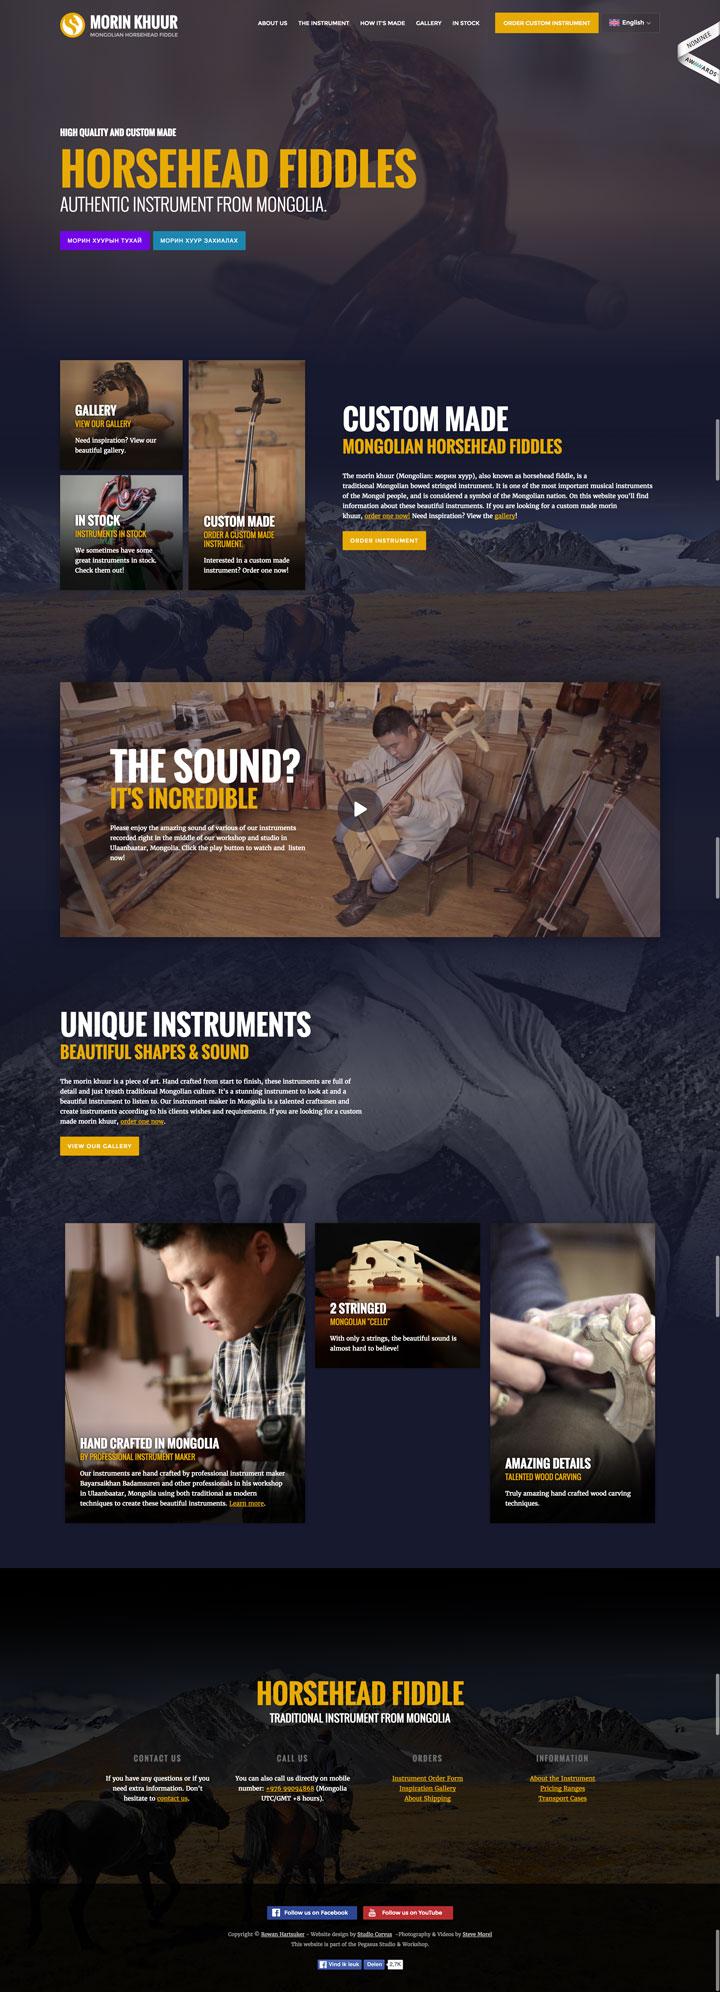 Homepage of the Morin Khuur Horsehead Fiddles website